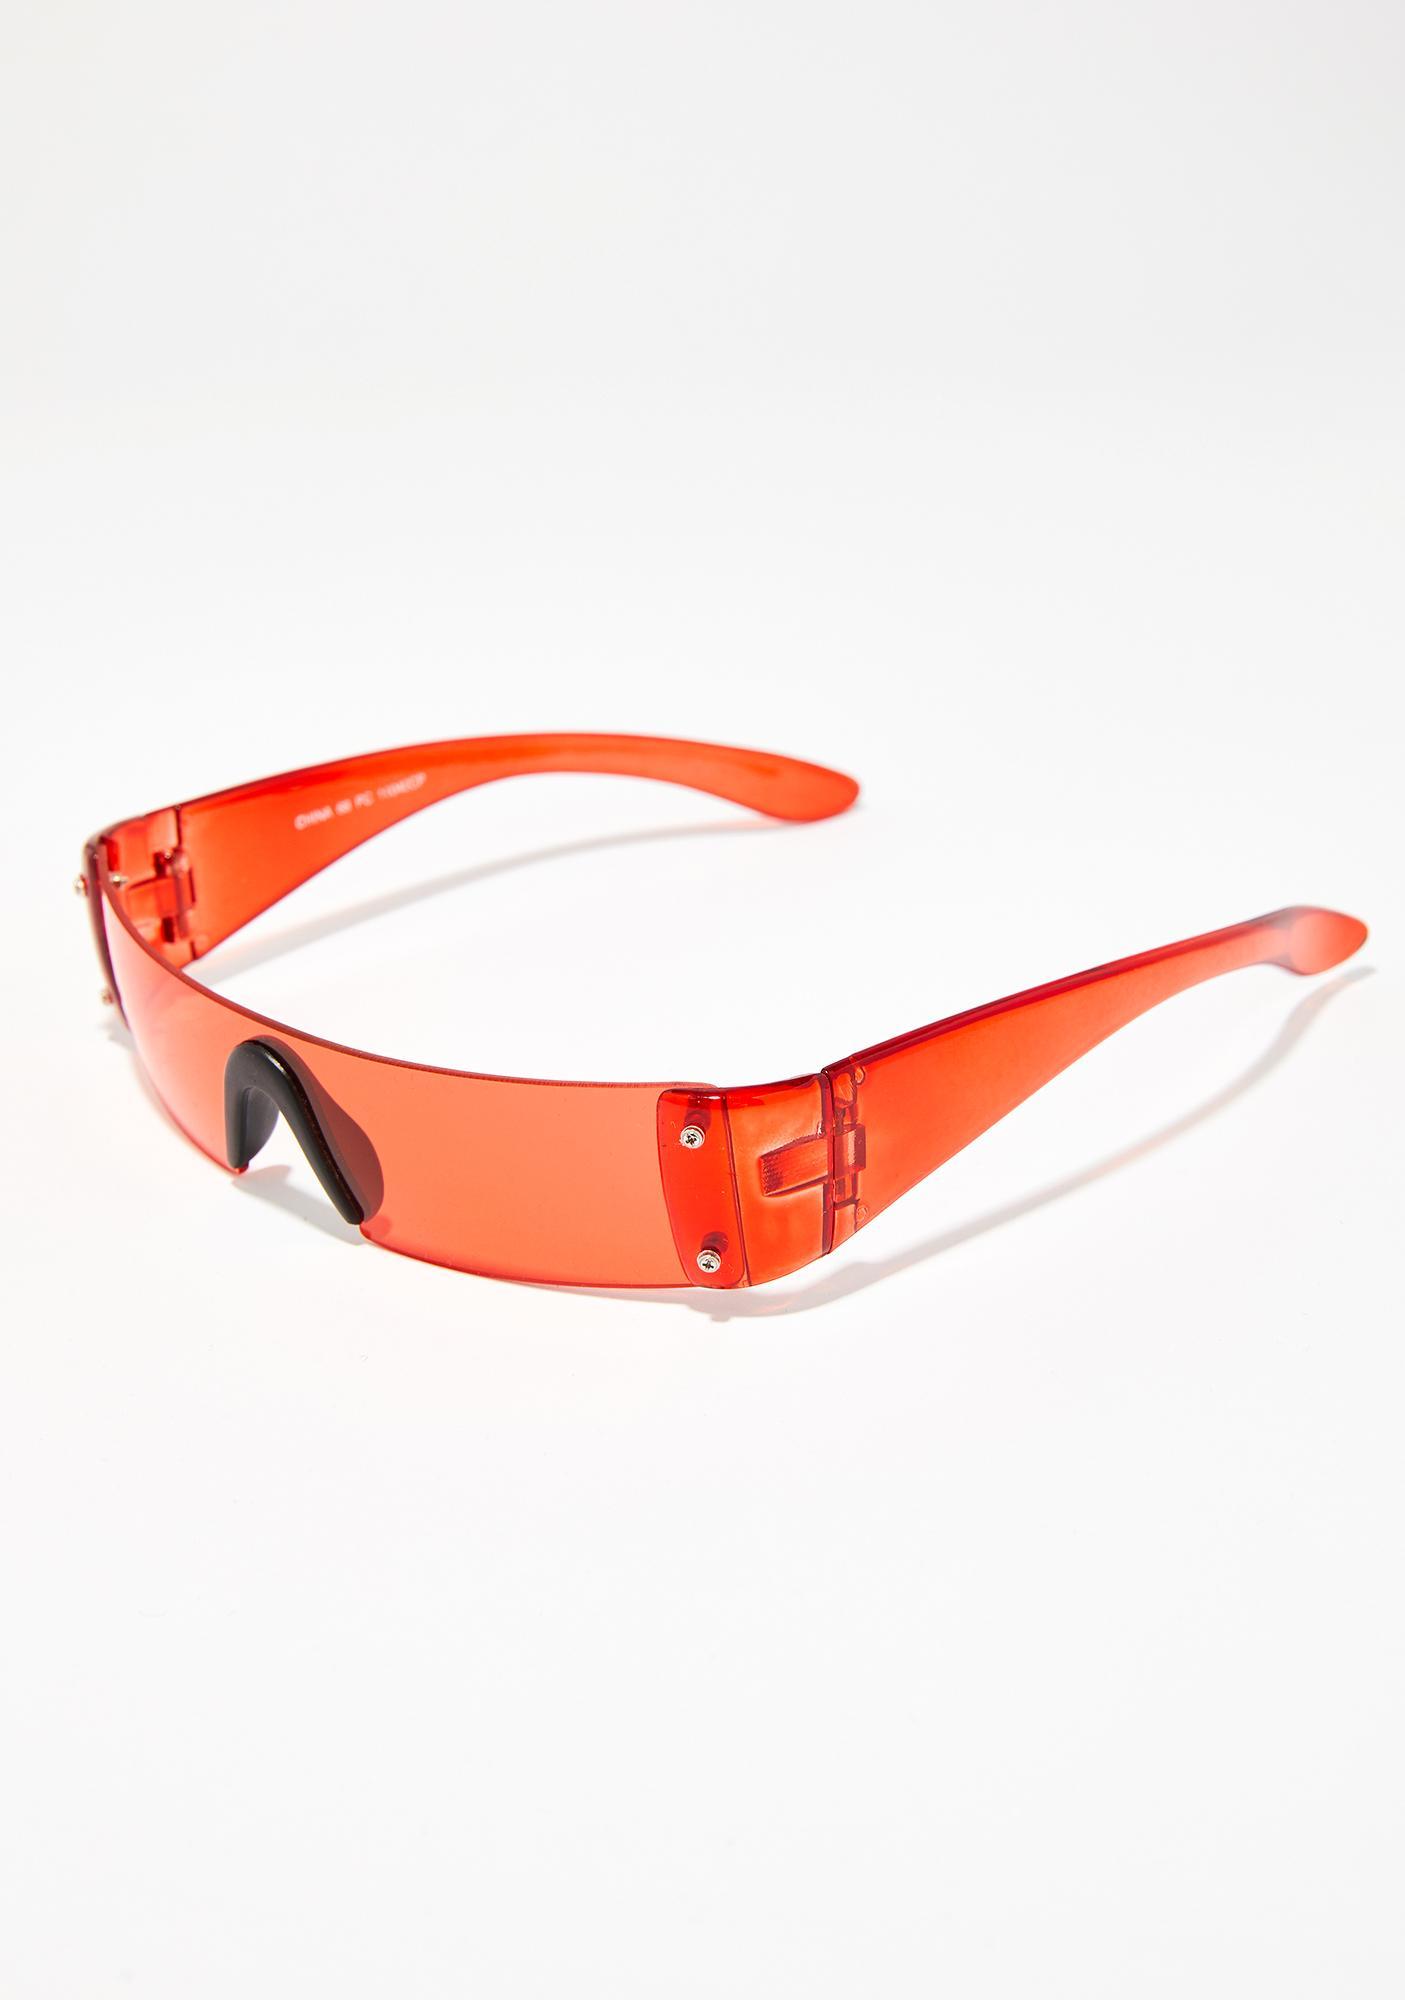 4169cc0c12 ... Lit Future Hustle Shield Sunglasses